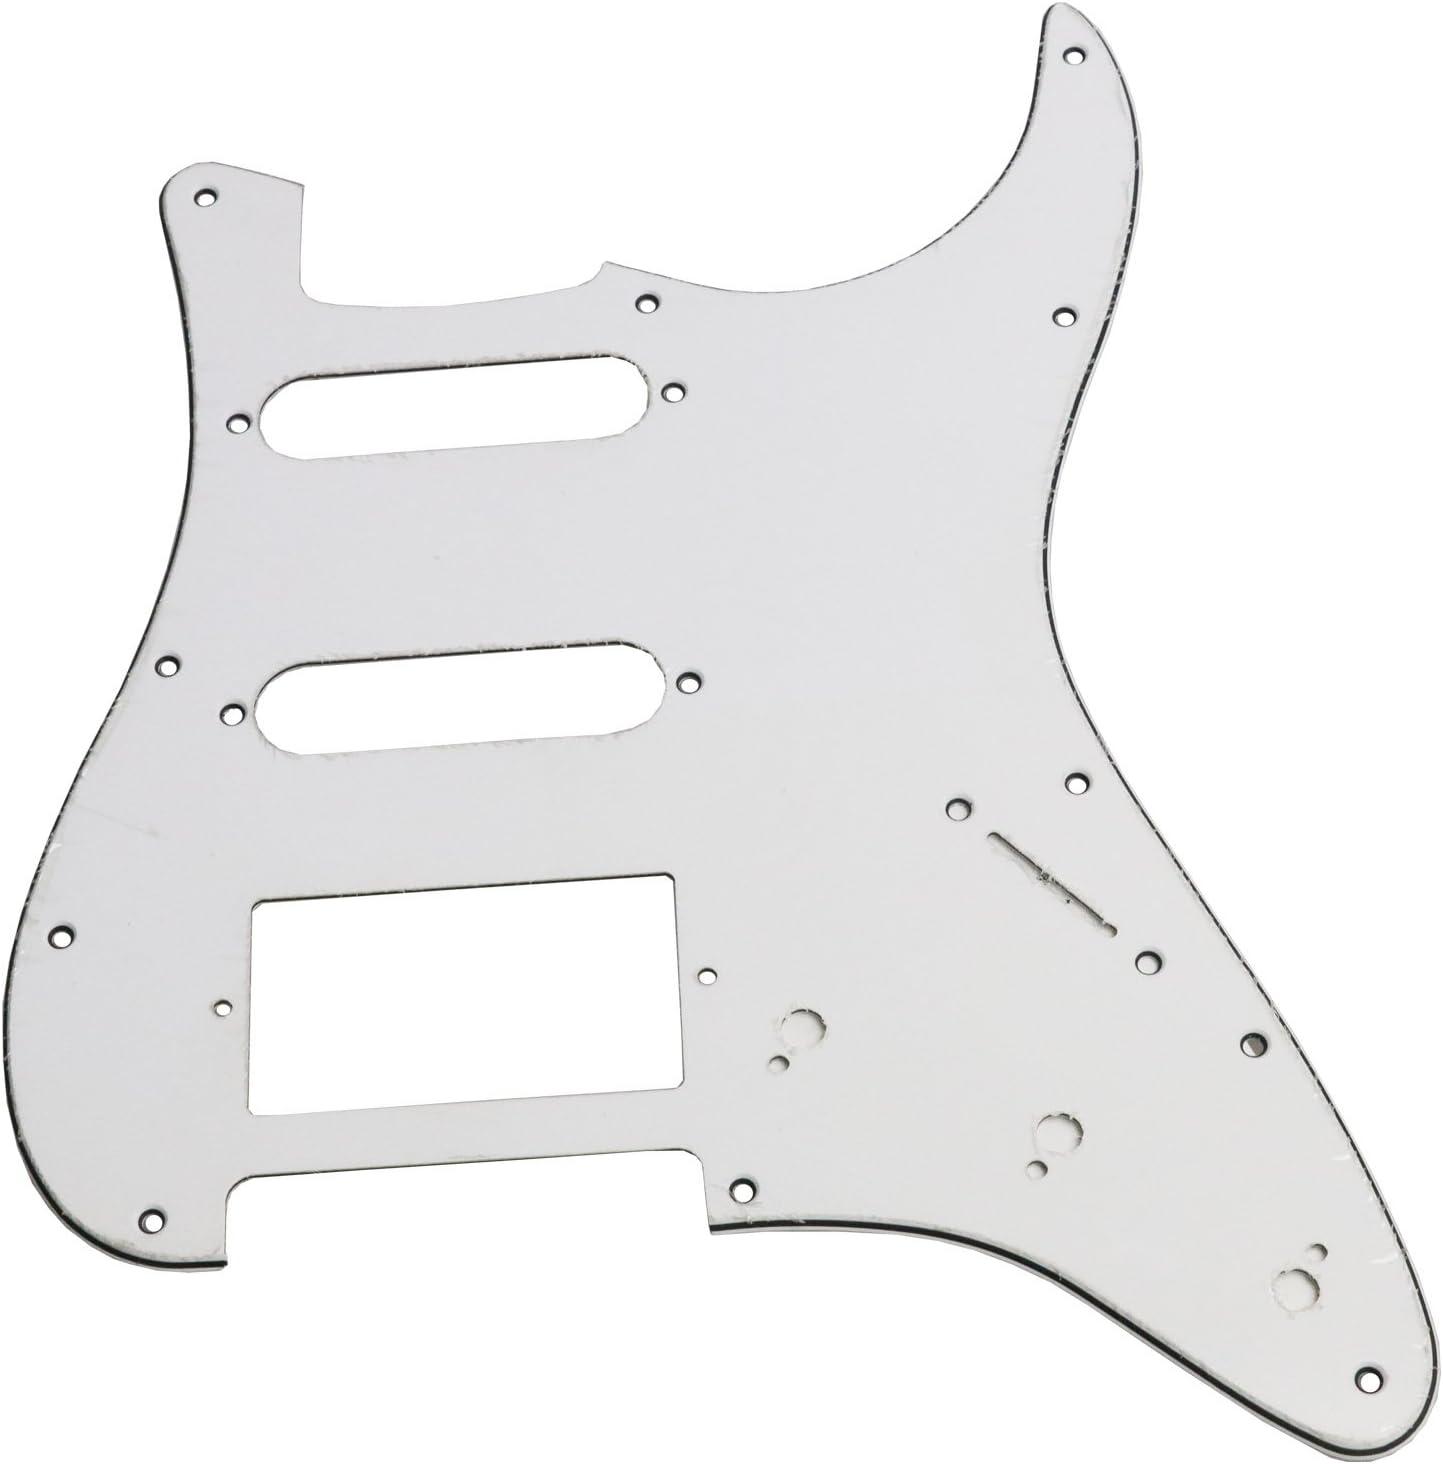 3 ply pour guitare strat black NEW PICKGUARD STRATOCASTER SSS